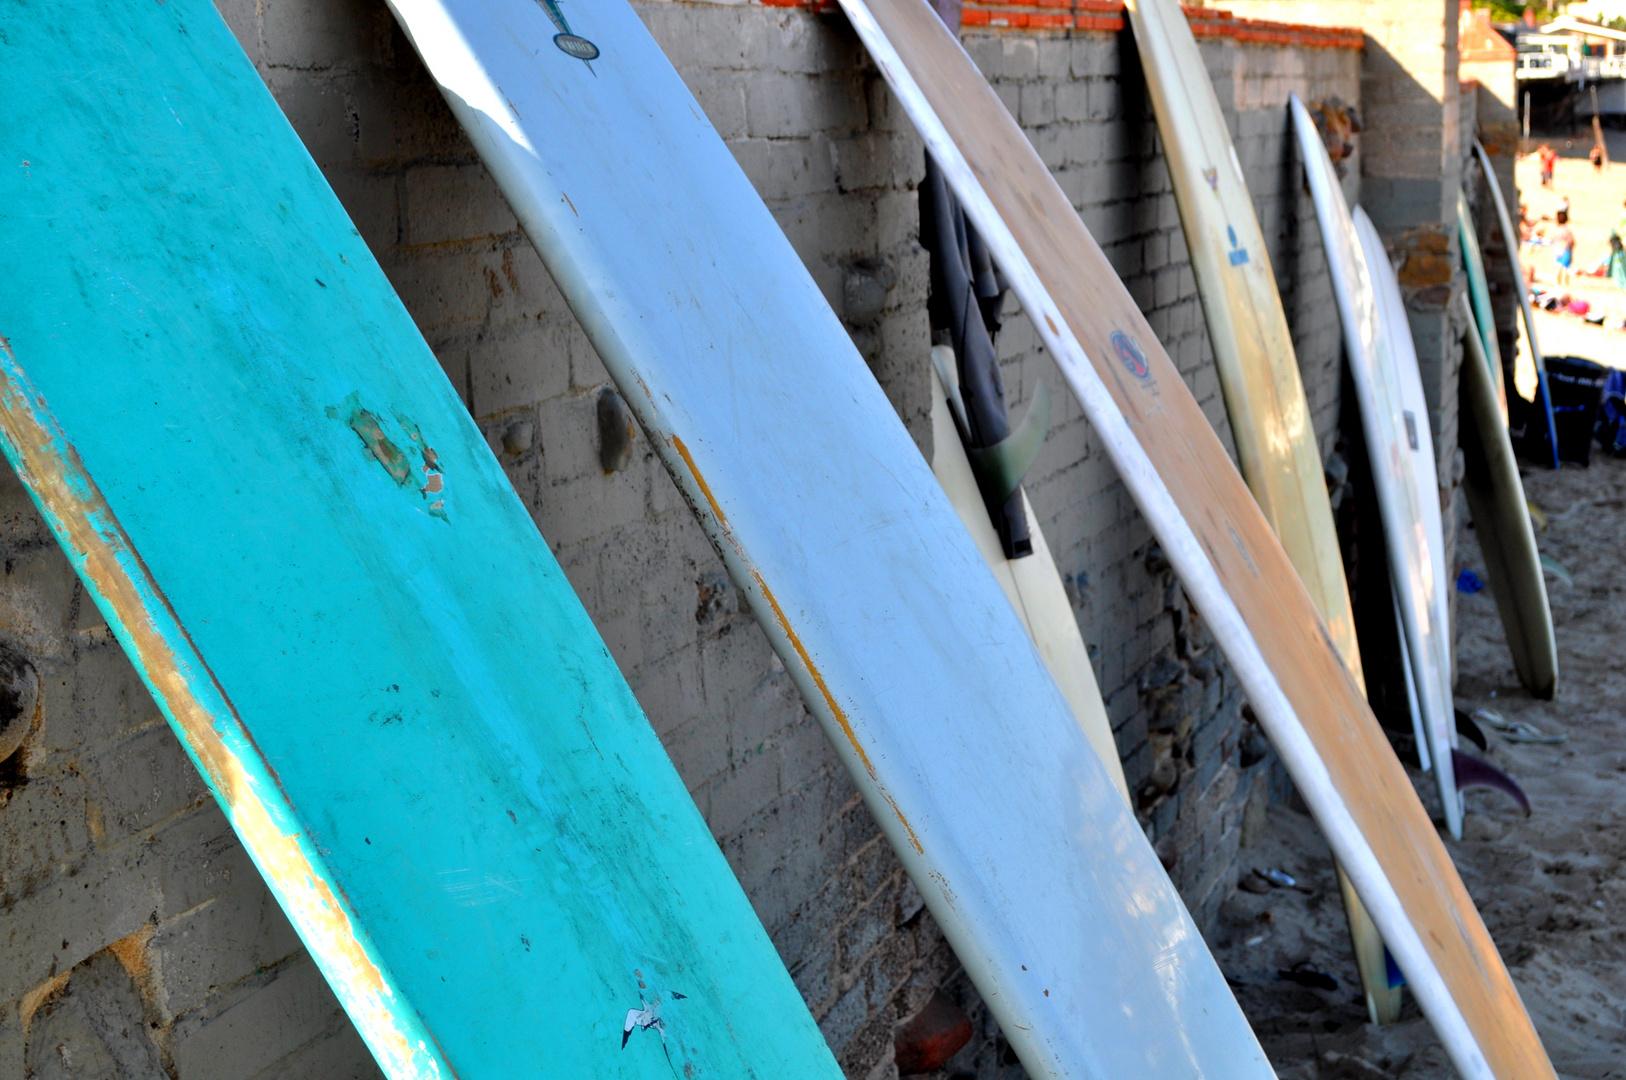 Surfboards...